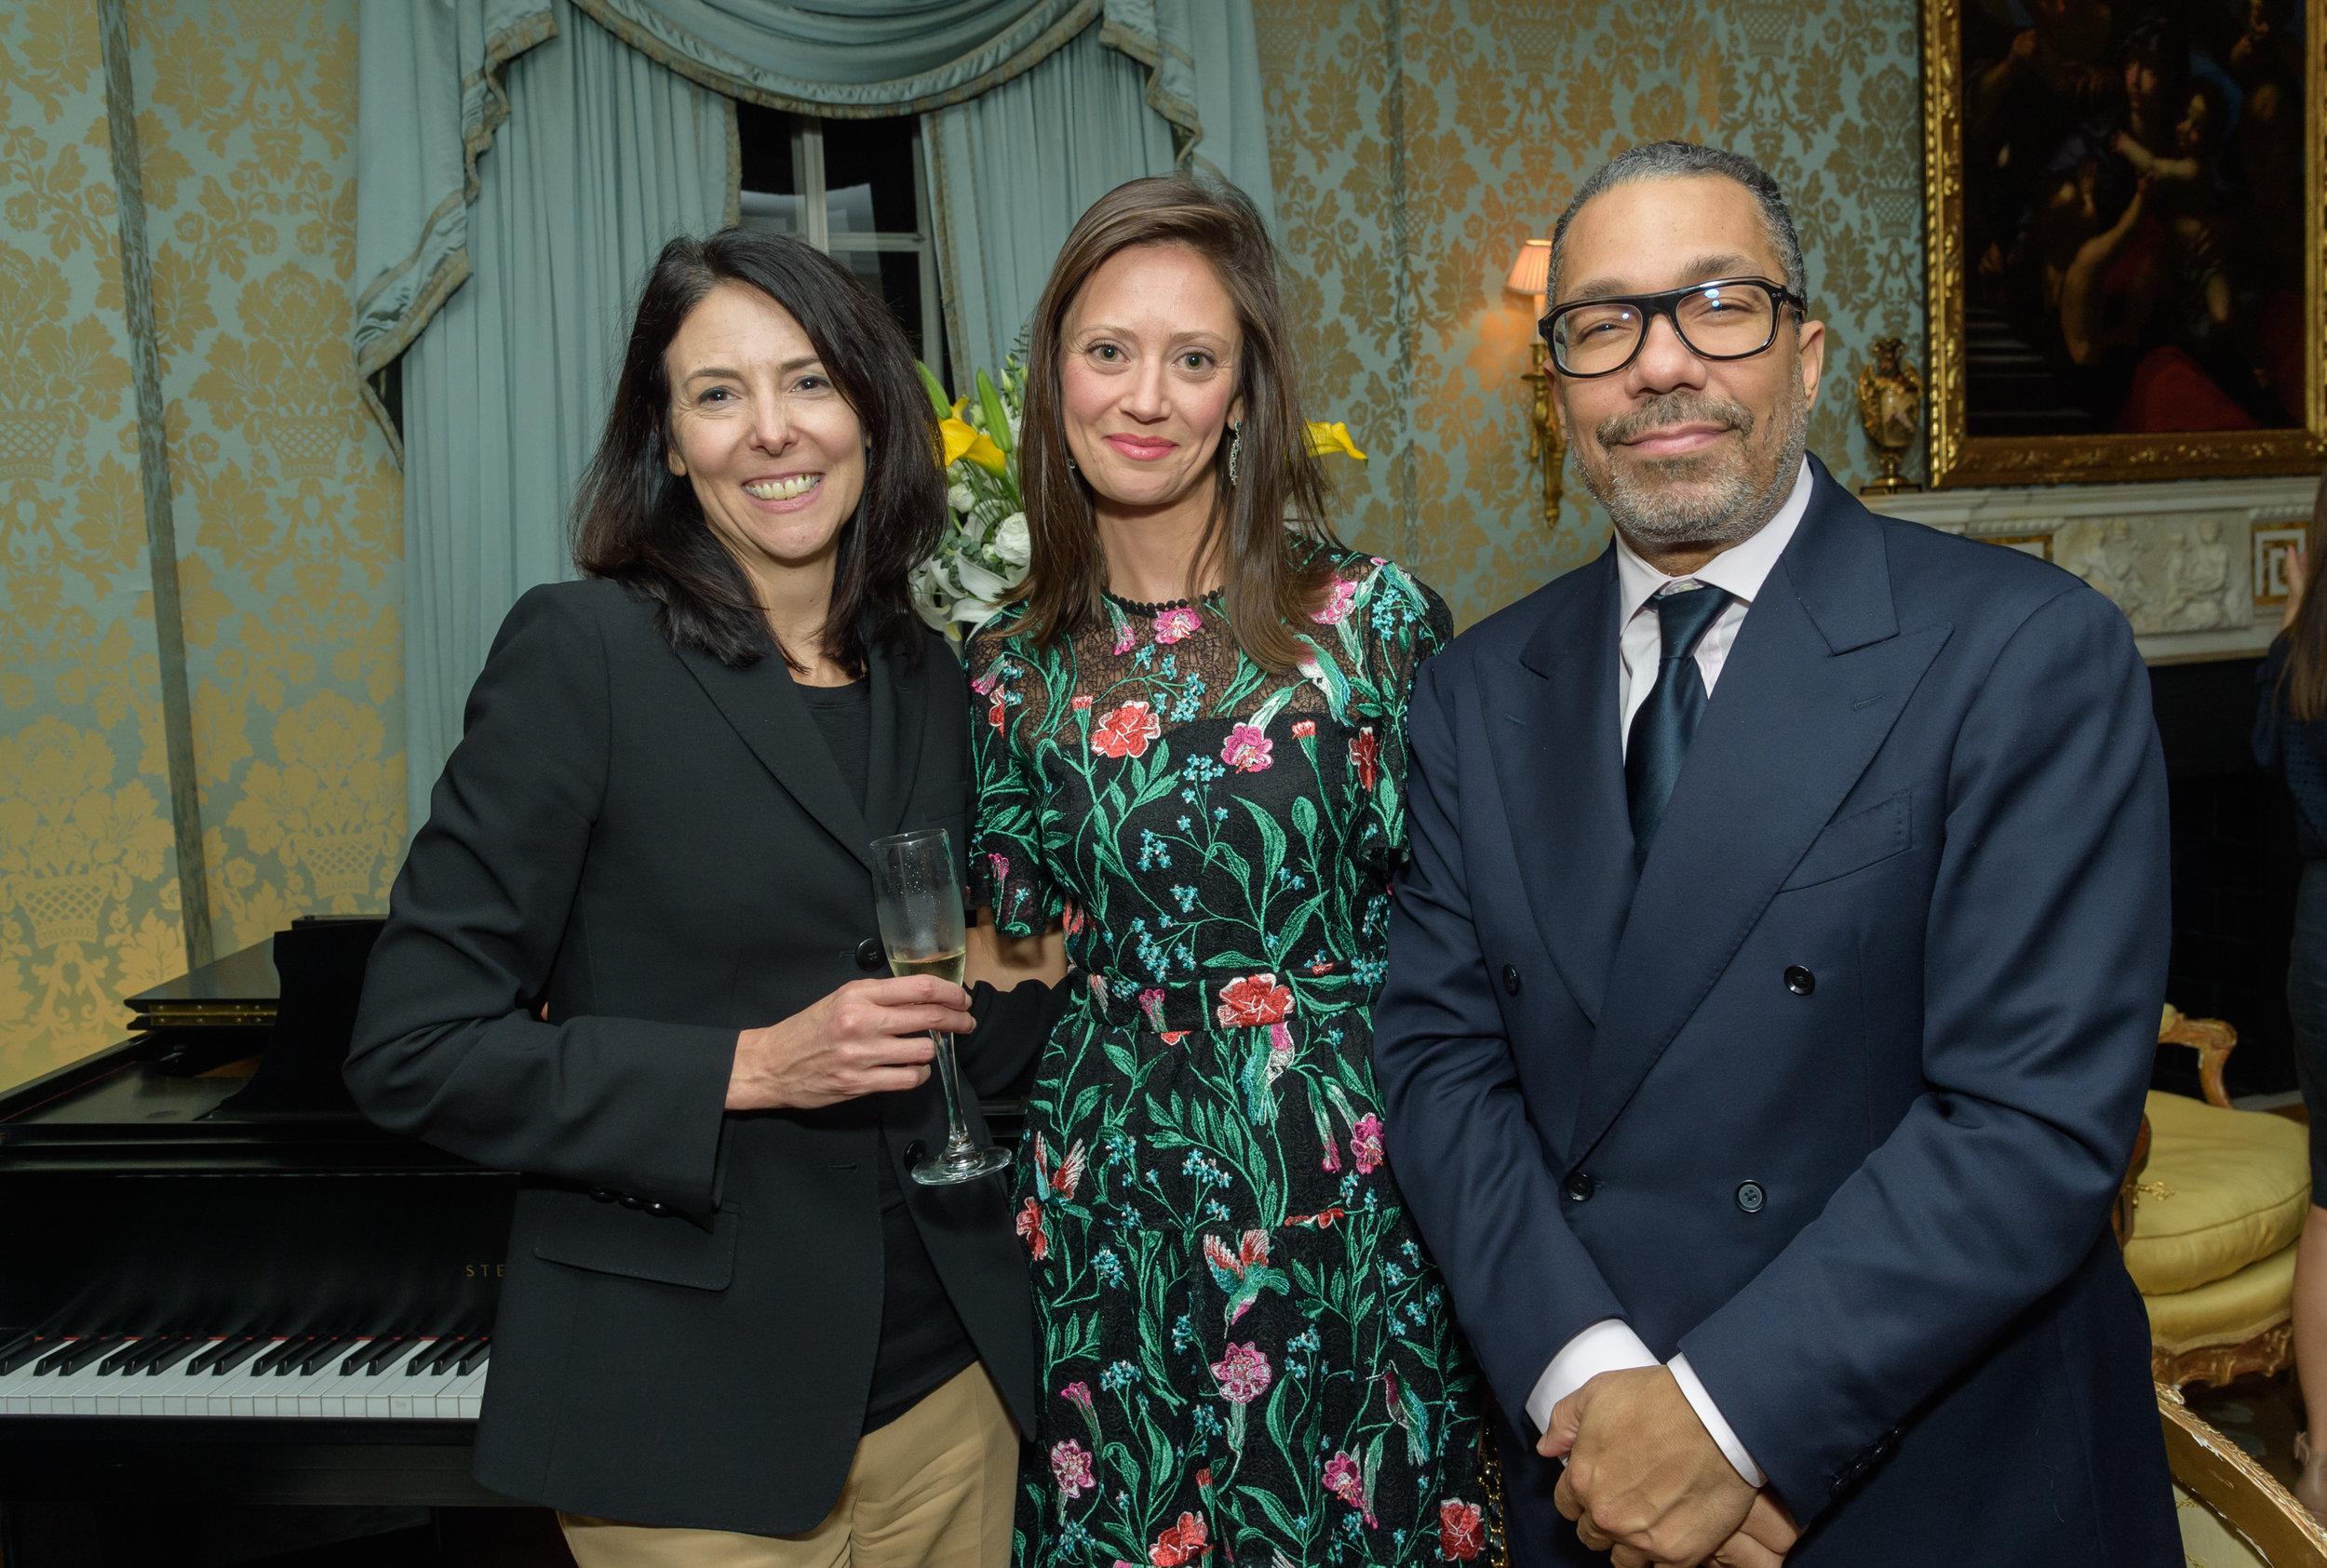 Melissa Smith, Suzanne Hall and Valentino Carlotti .jpg